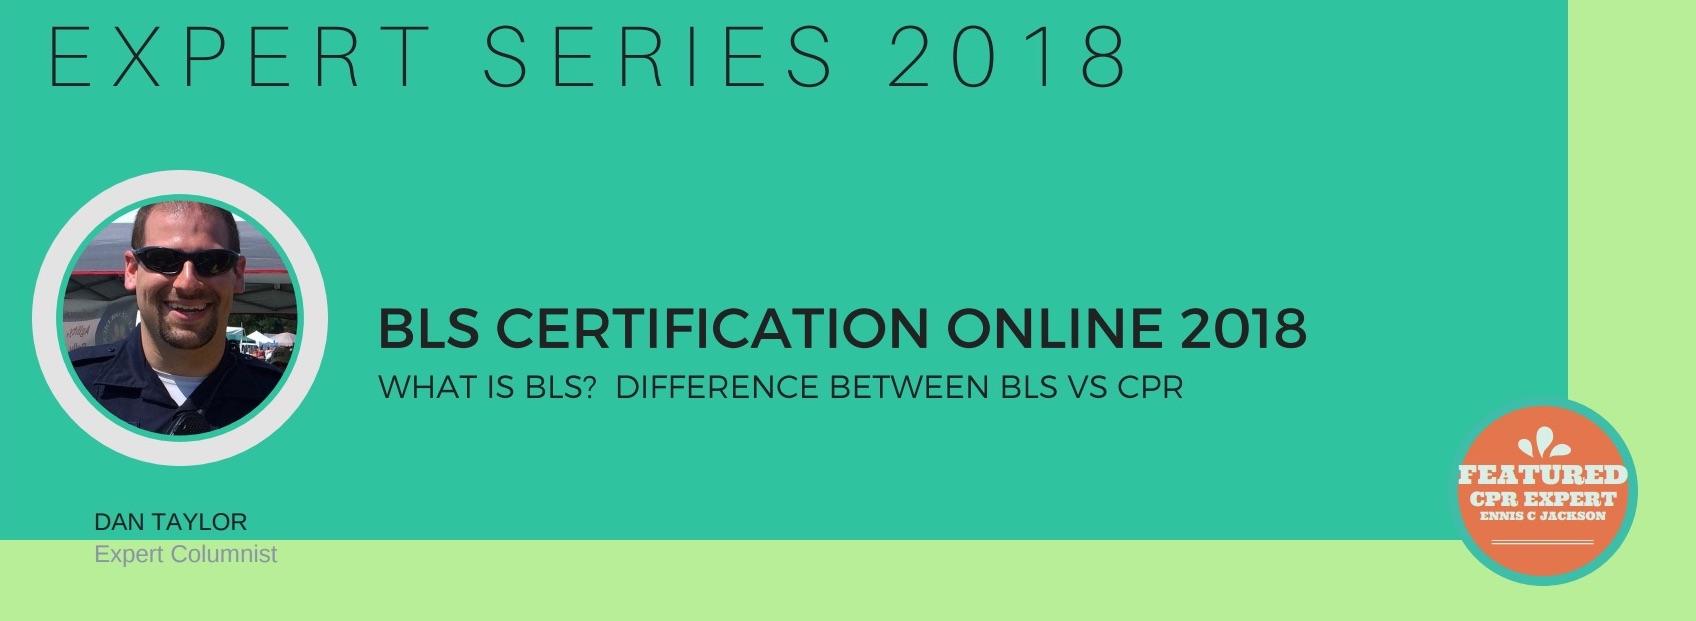 bls certification cpr